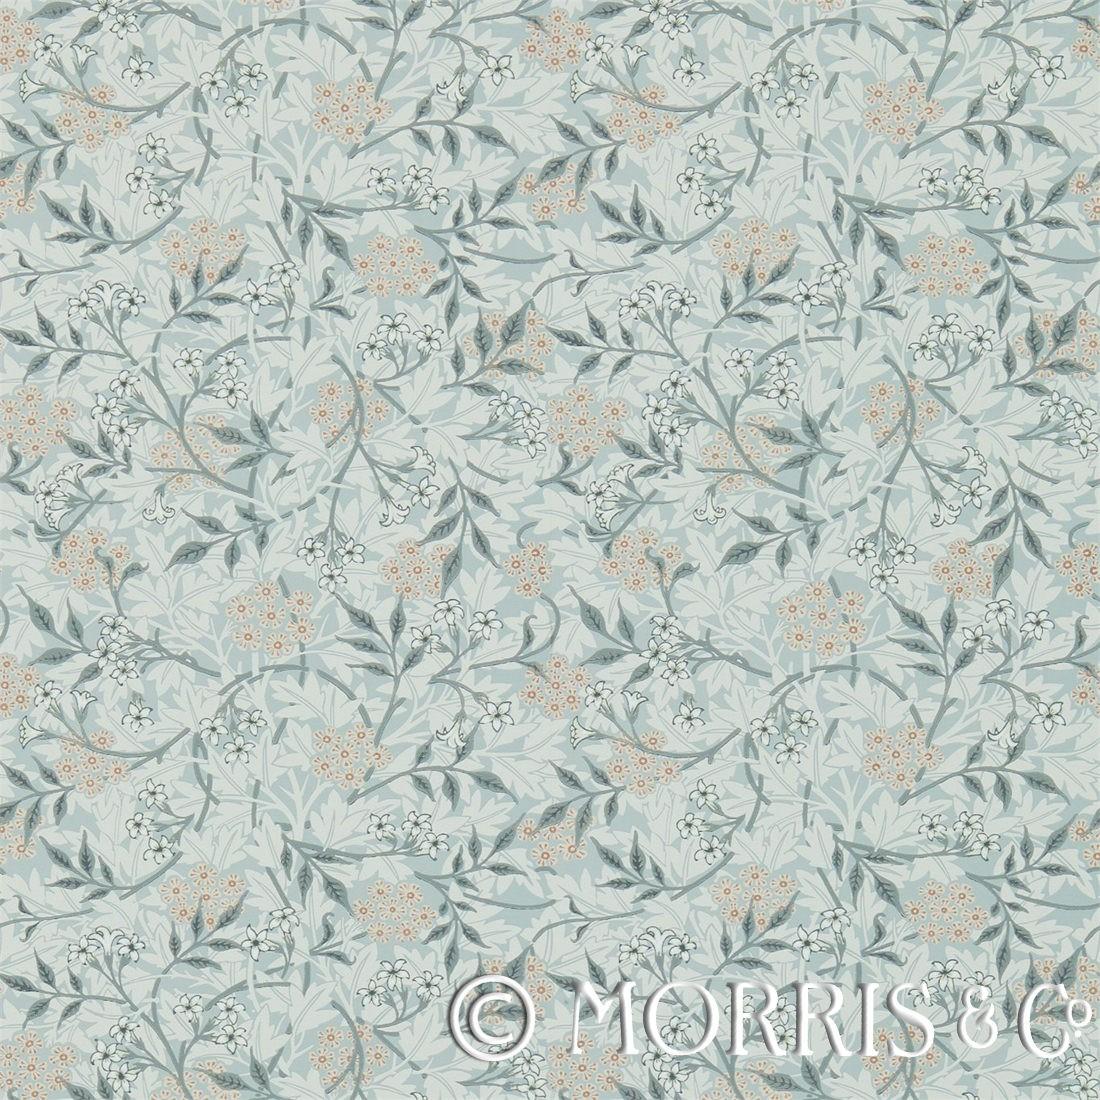 Morris & Co Tapet Jasmine Silver/Charcoal